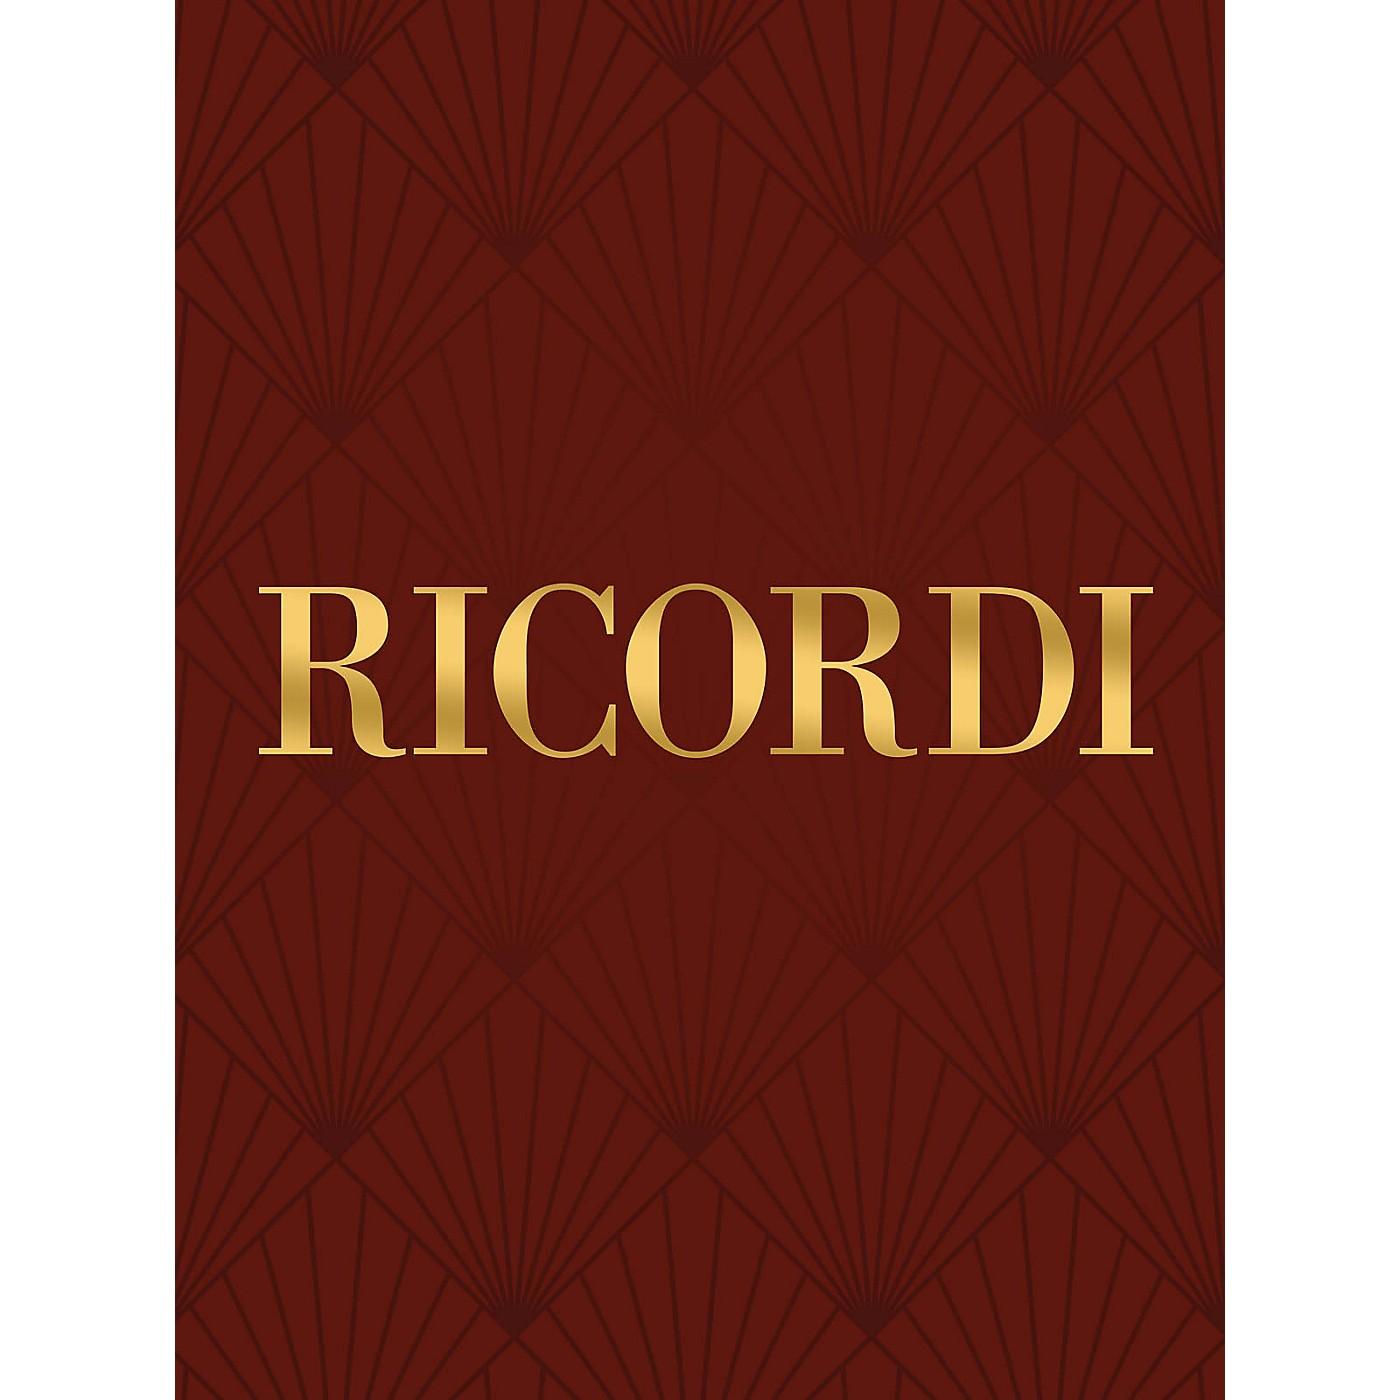 Ricordi East, Tomkins, Wilbye (Descant/treble/tenor recorders) Ricordi London Series thumbnail